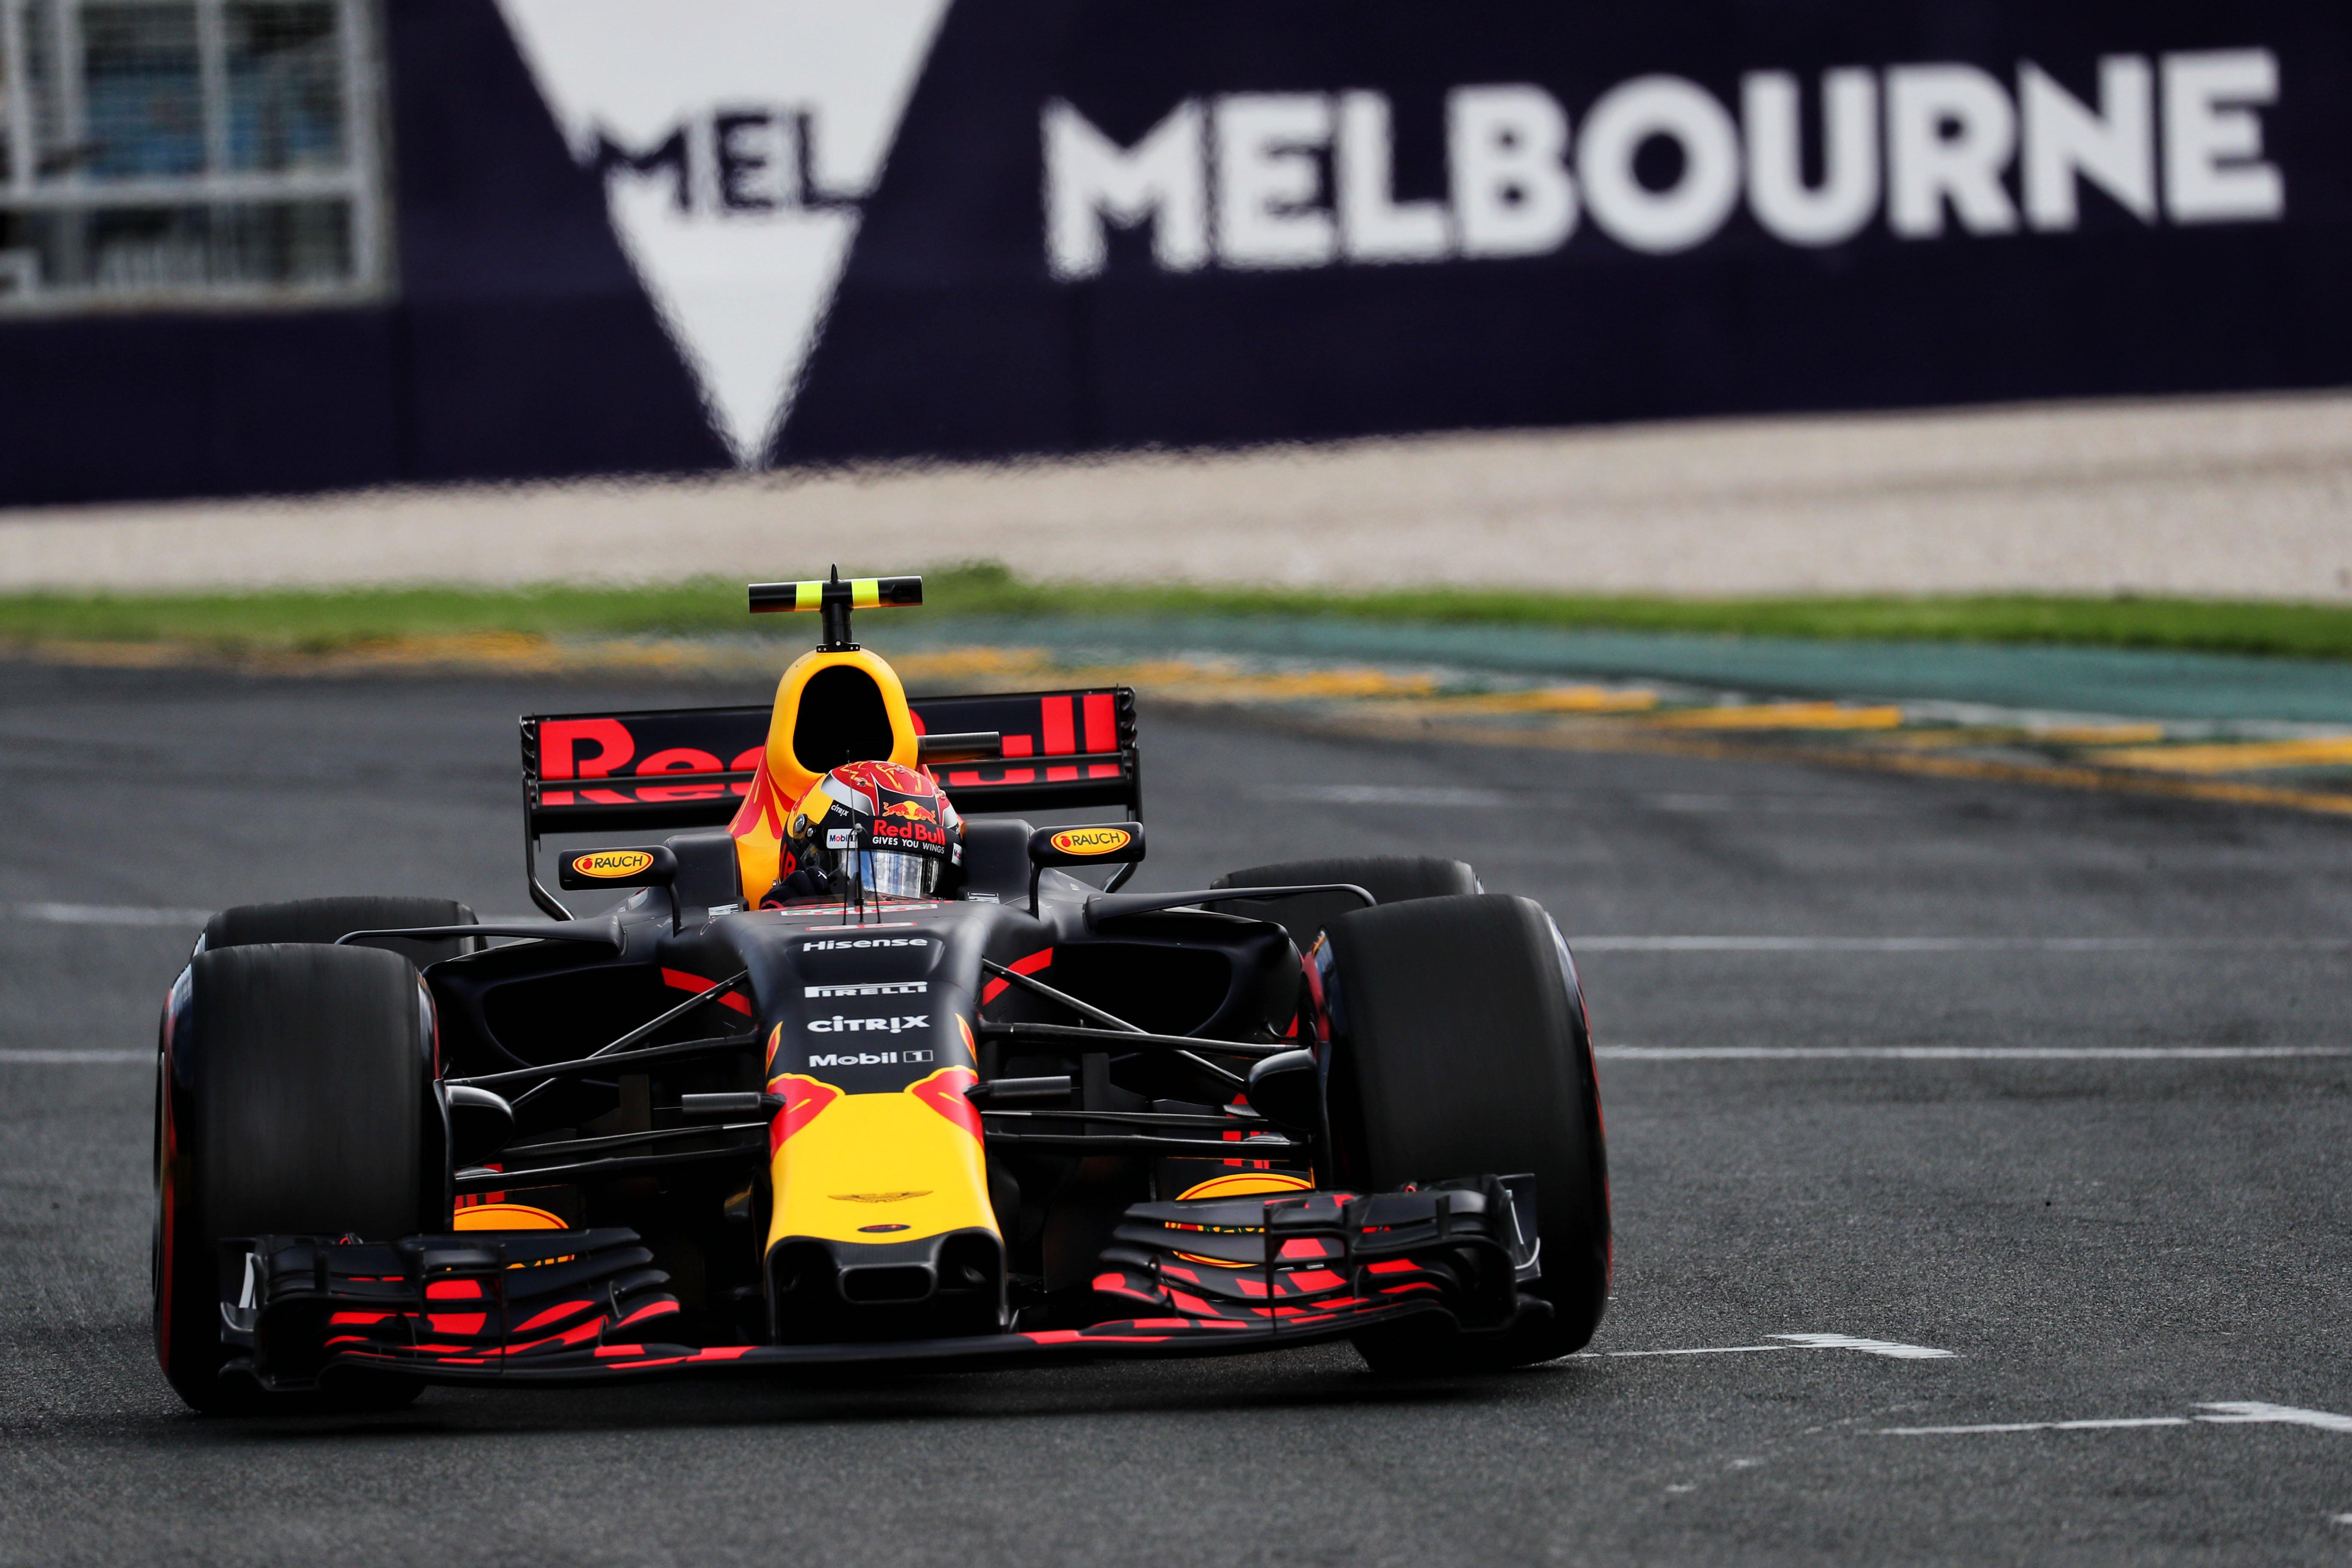 formula one world championship 2017 round 1 australian grand prix melbourne australia. Black Bedroom Furniture Sets. Home Design Ideas